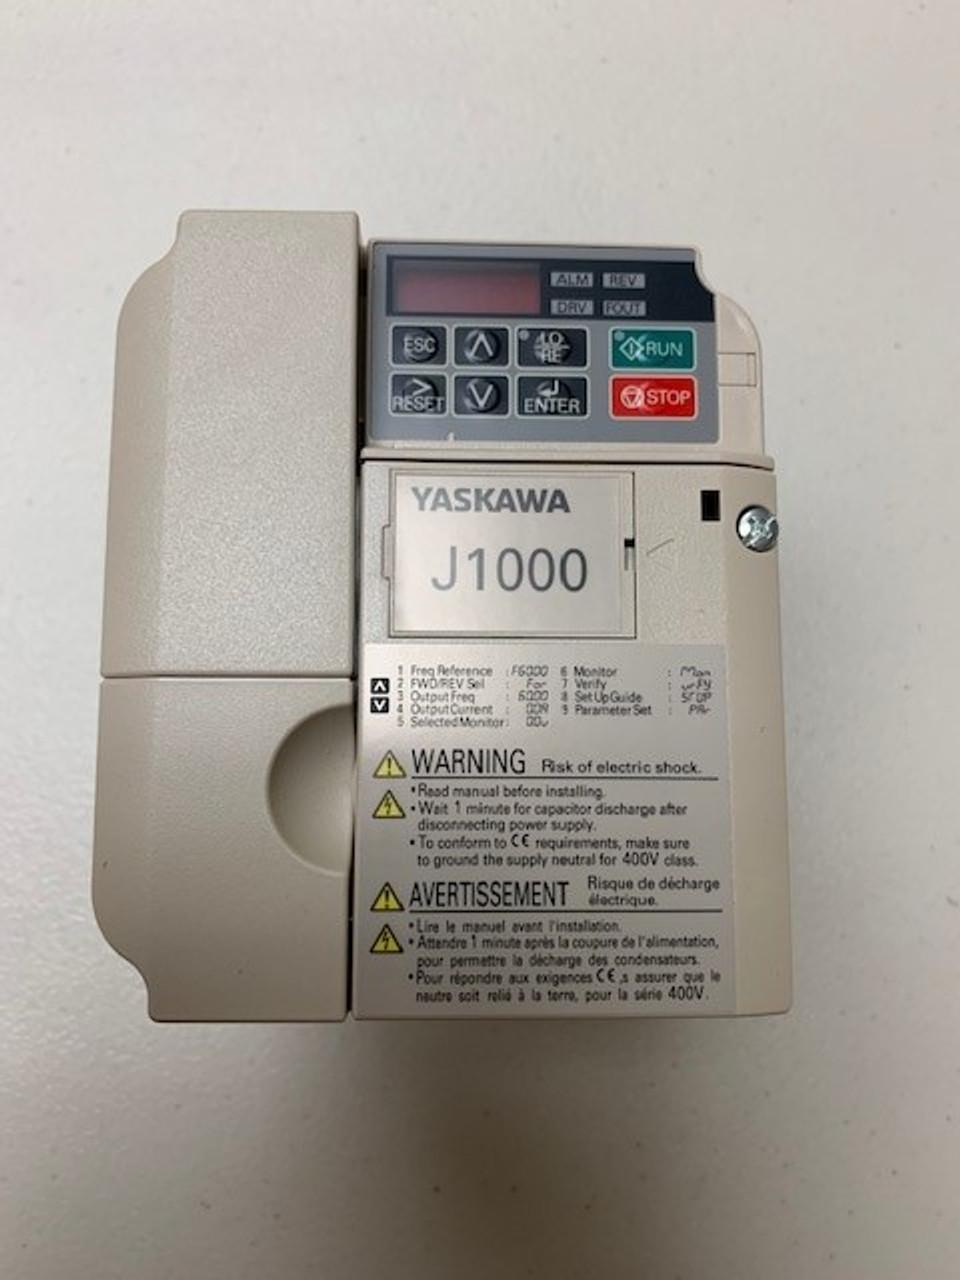 R75330 VFD 5HP 480V-J1000 YASKAWA